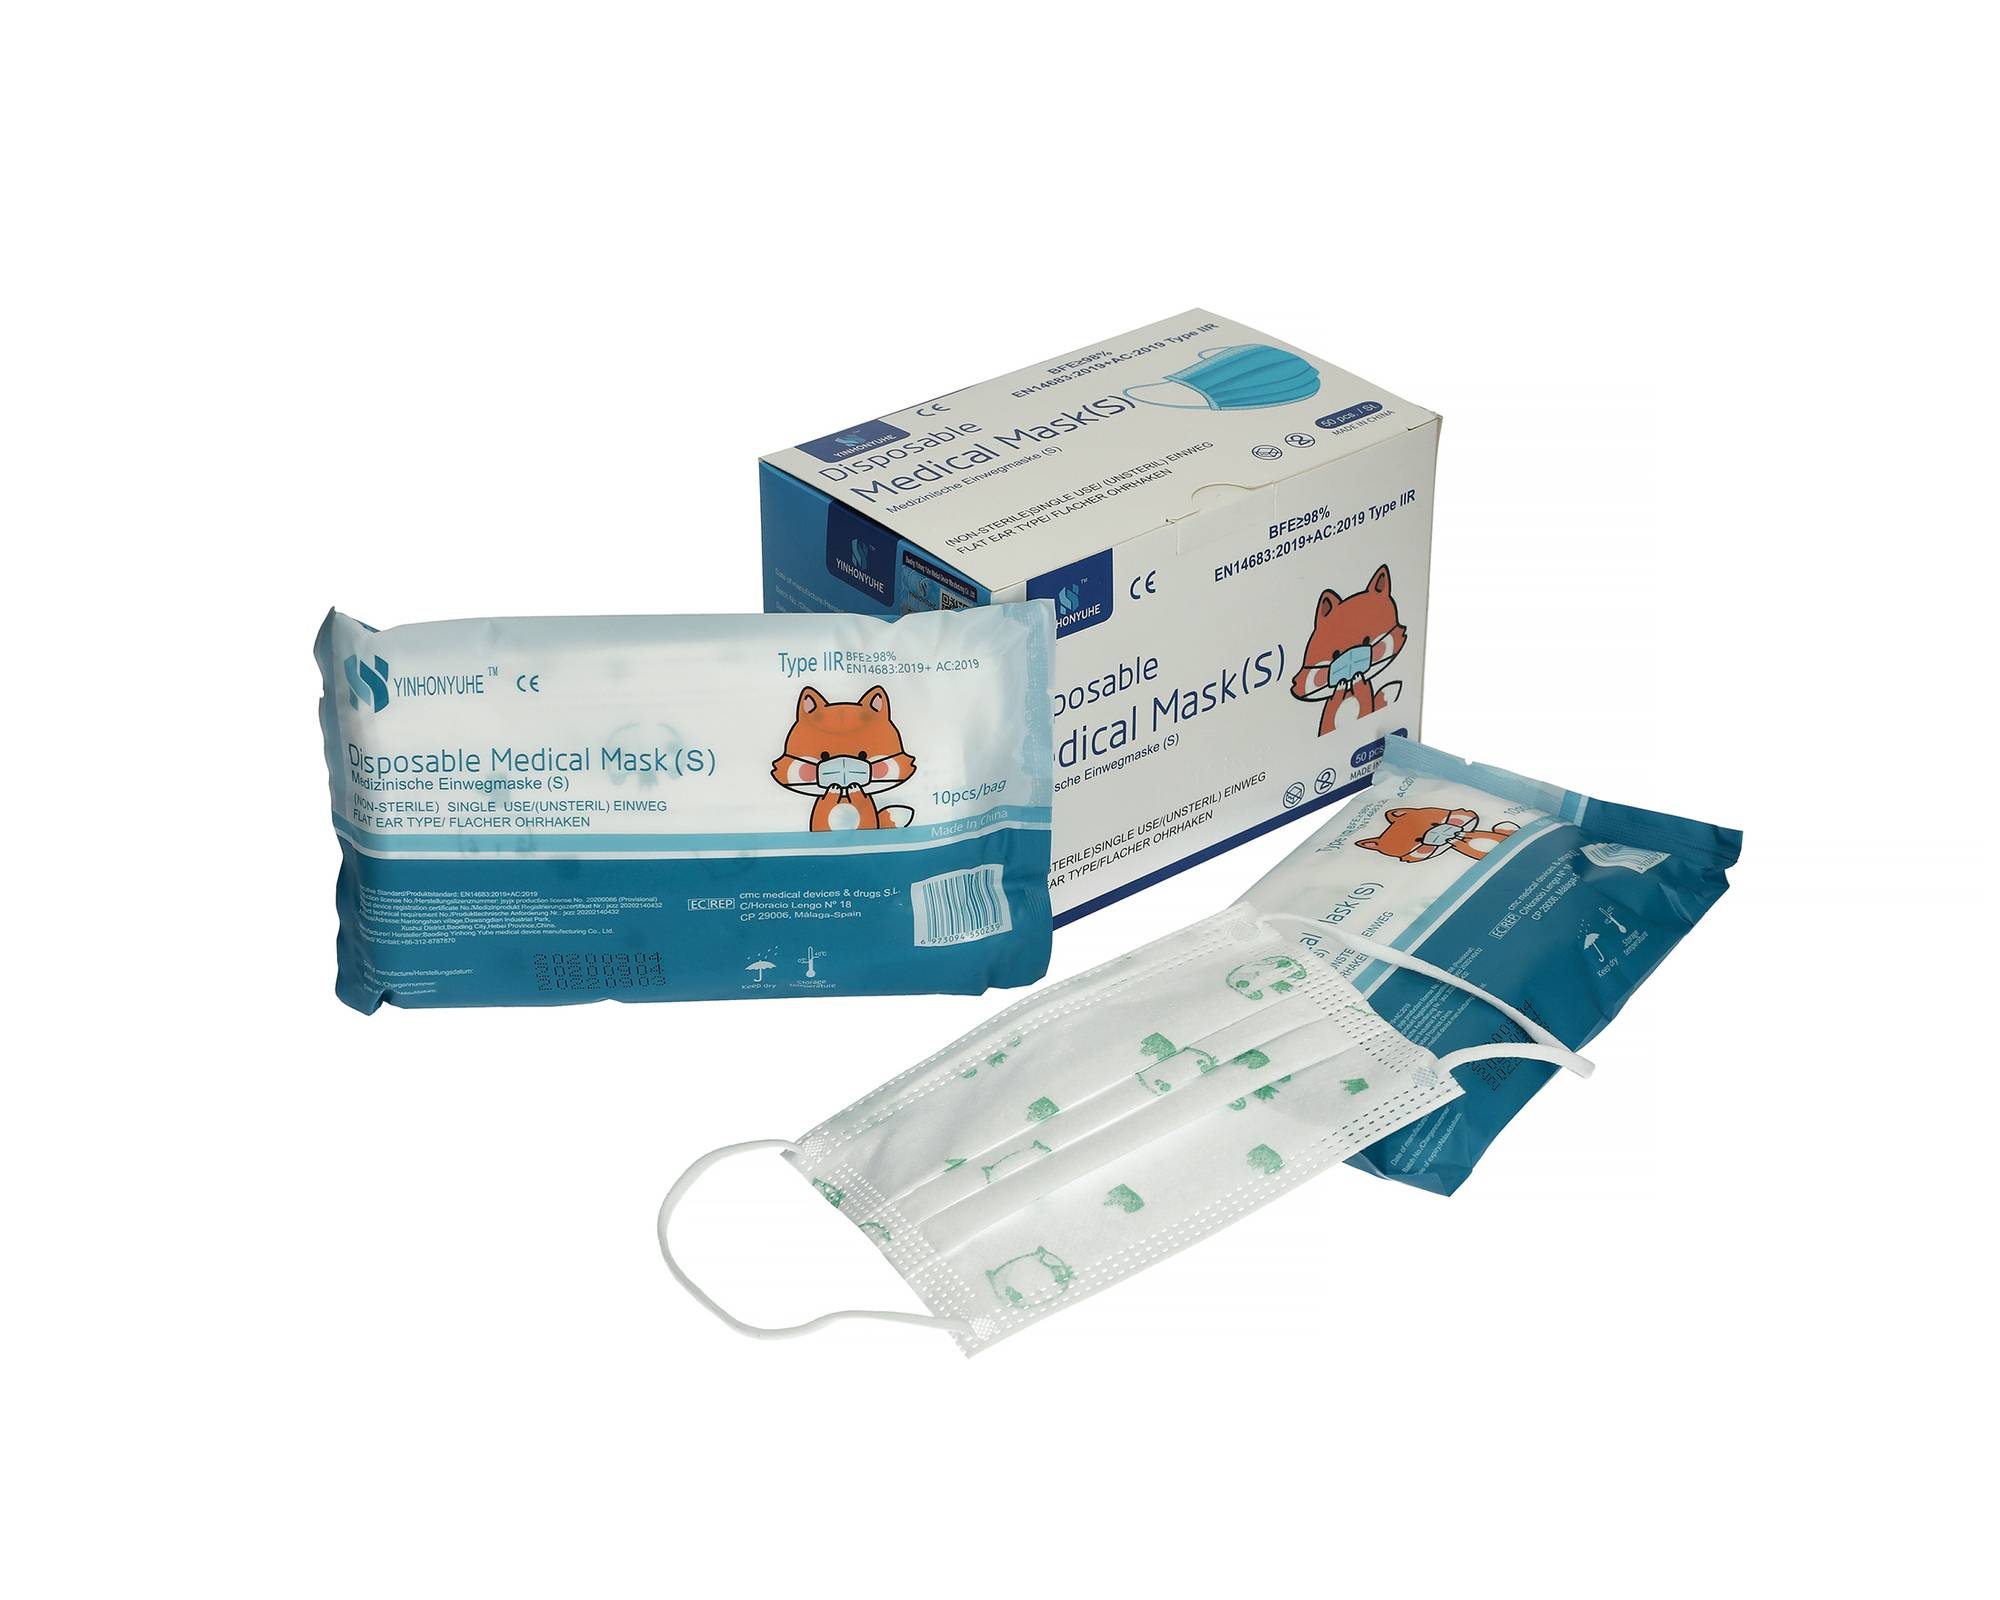 YINHONYUHE Masques enfant jetables 3 plis boîte de 50 pièces - YINHONYUHE - MASQUES9